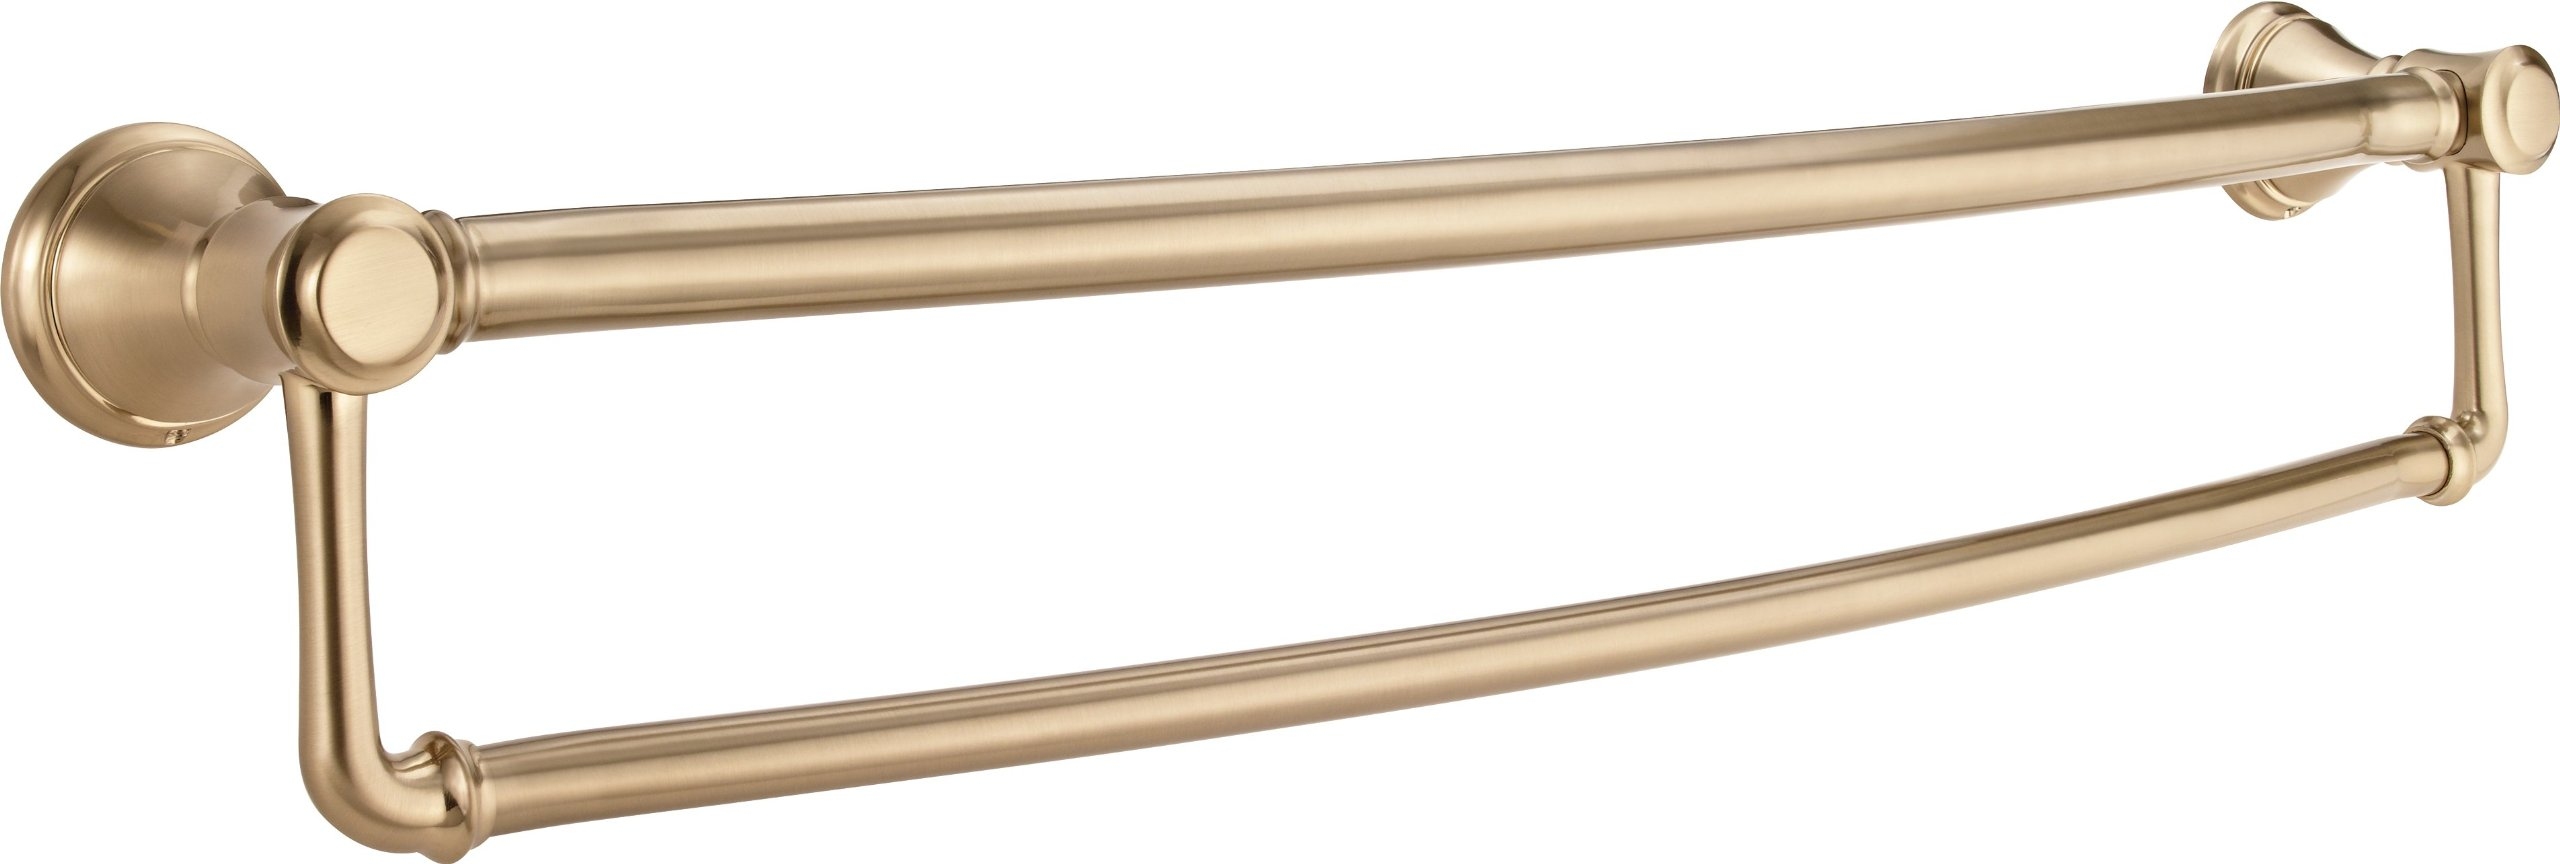 Delta Faucet 41319-CZ Traditional Towel/Assist Bar, 24-Inch, Champagne Bronze